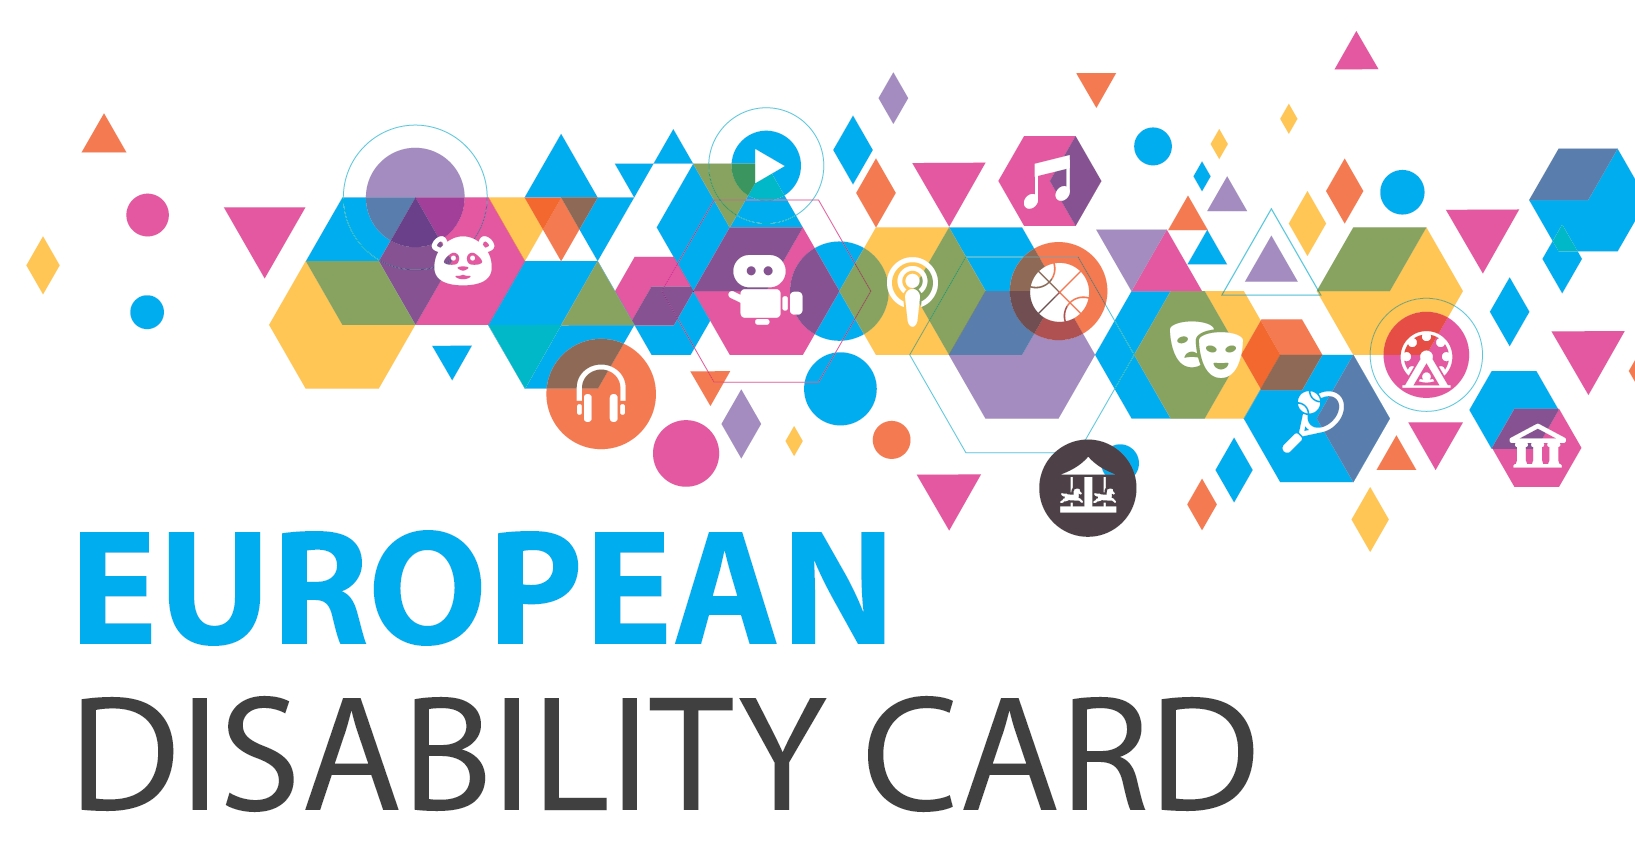 European Disabilty Card